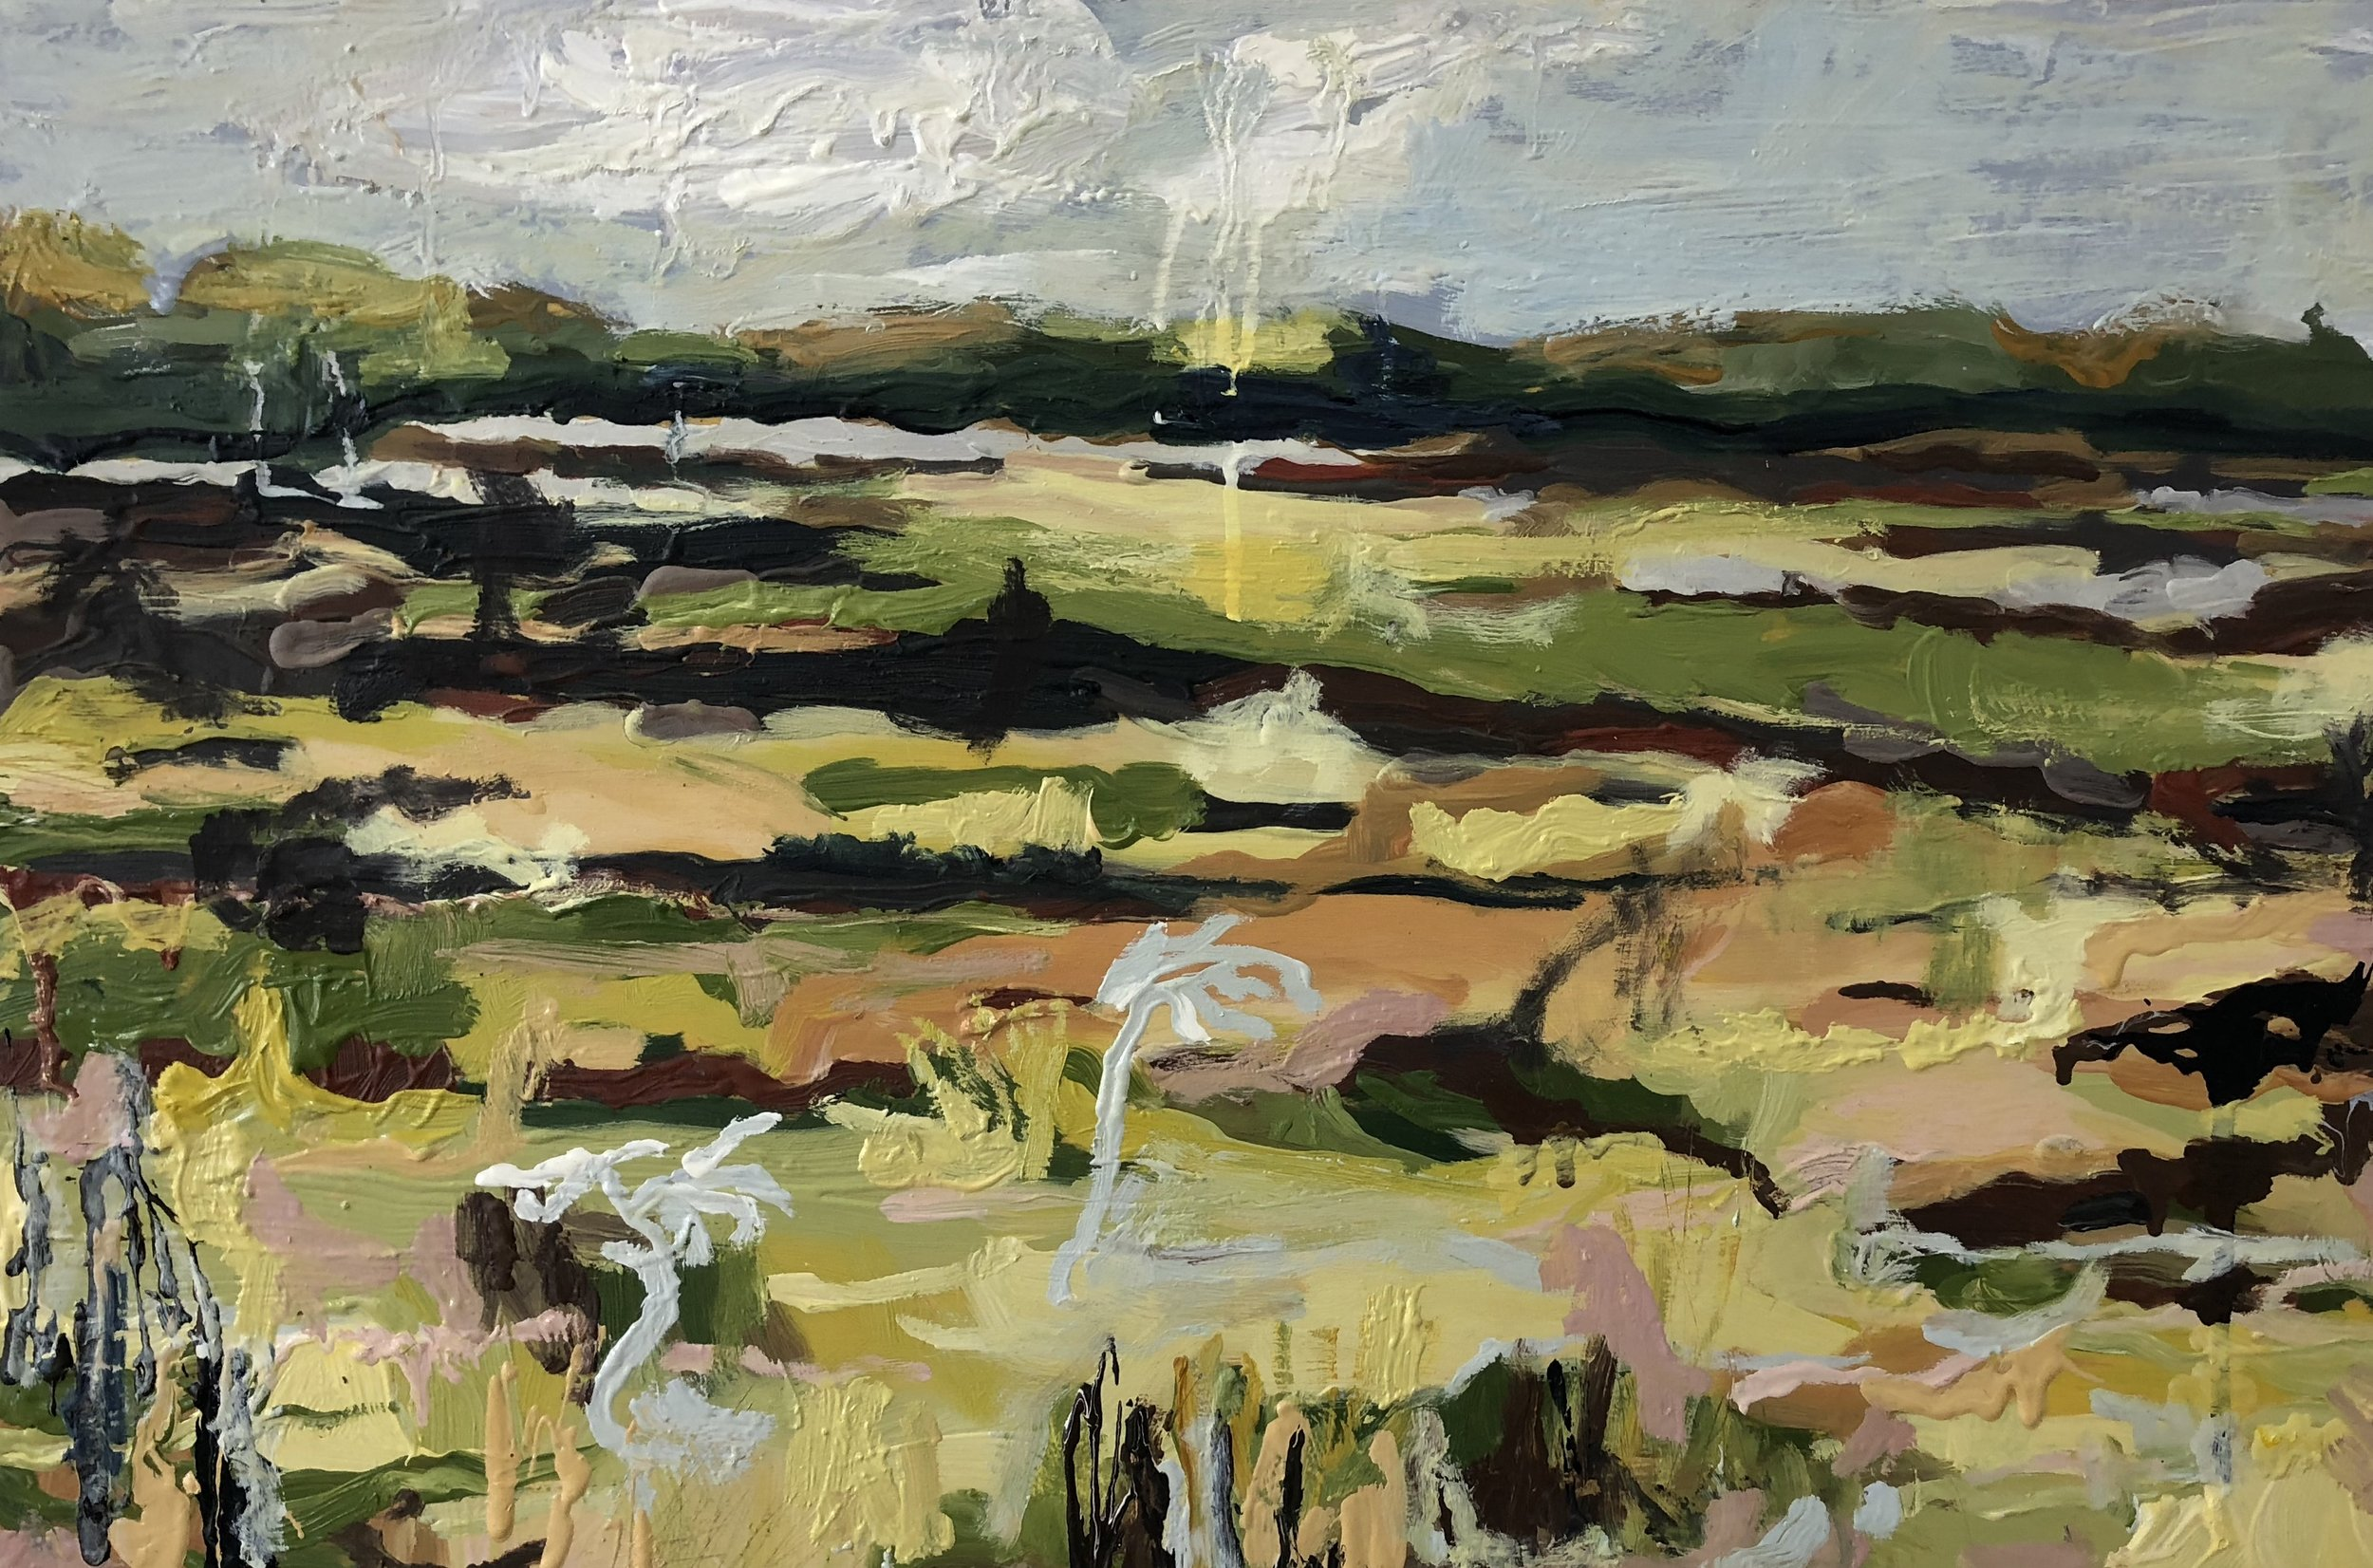 Michelle Teear  Poleblue Swamp  2018 oil paint on board, egg emulsion 40 x 60cm  $480.00